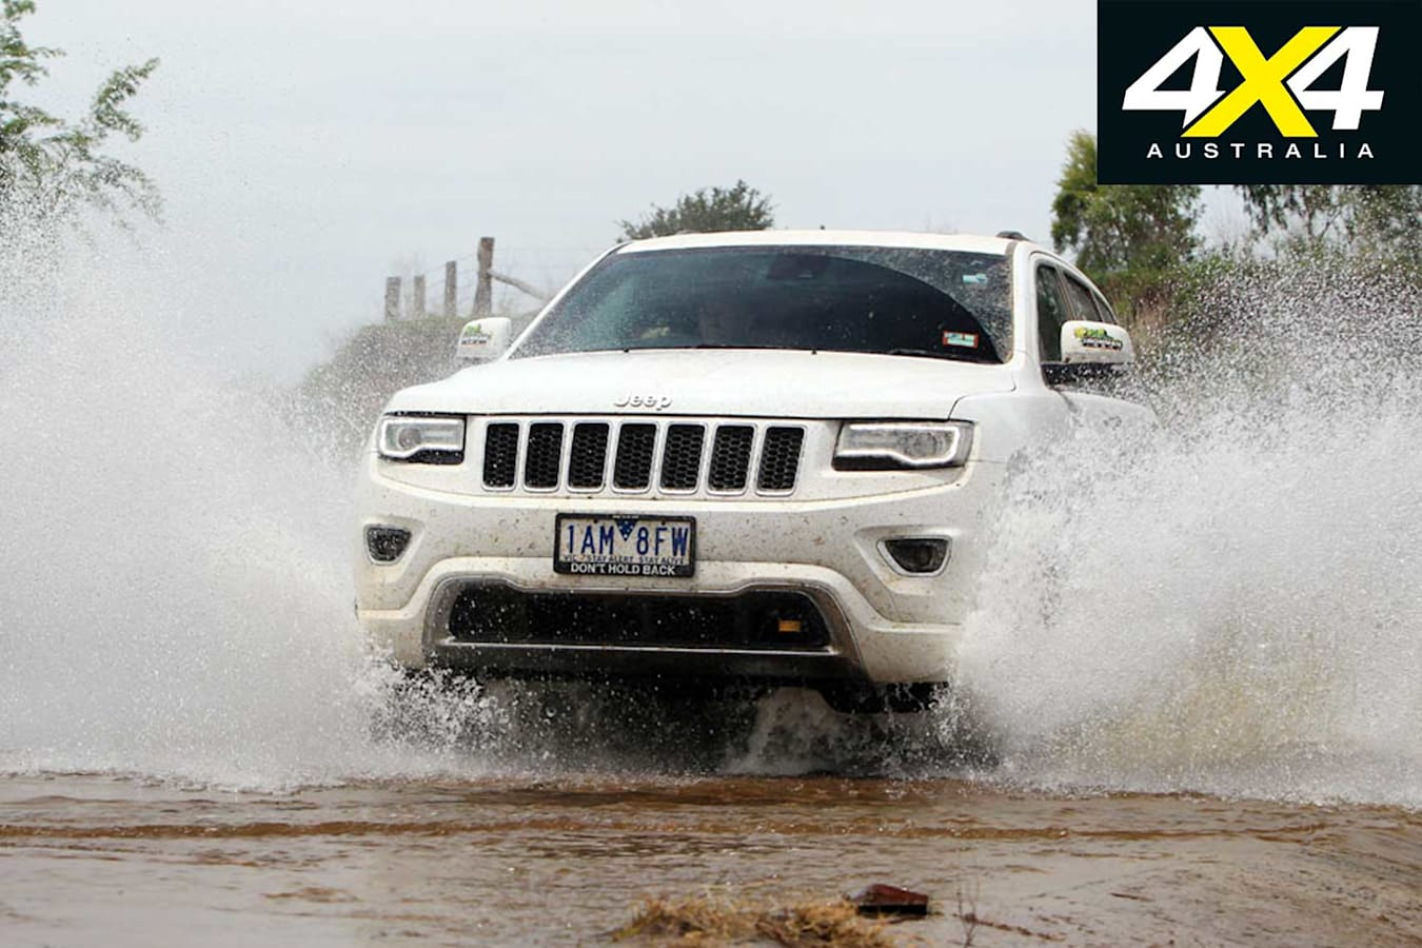 Past 4 X 4 OTY Winners 2014 Jeep Grand Cherokee Overland CRD Jpg